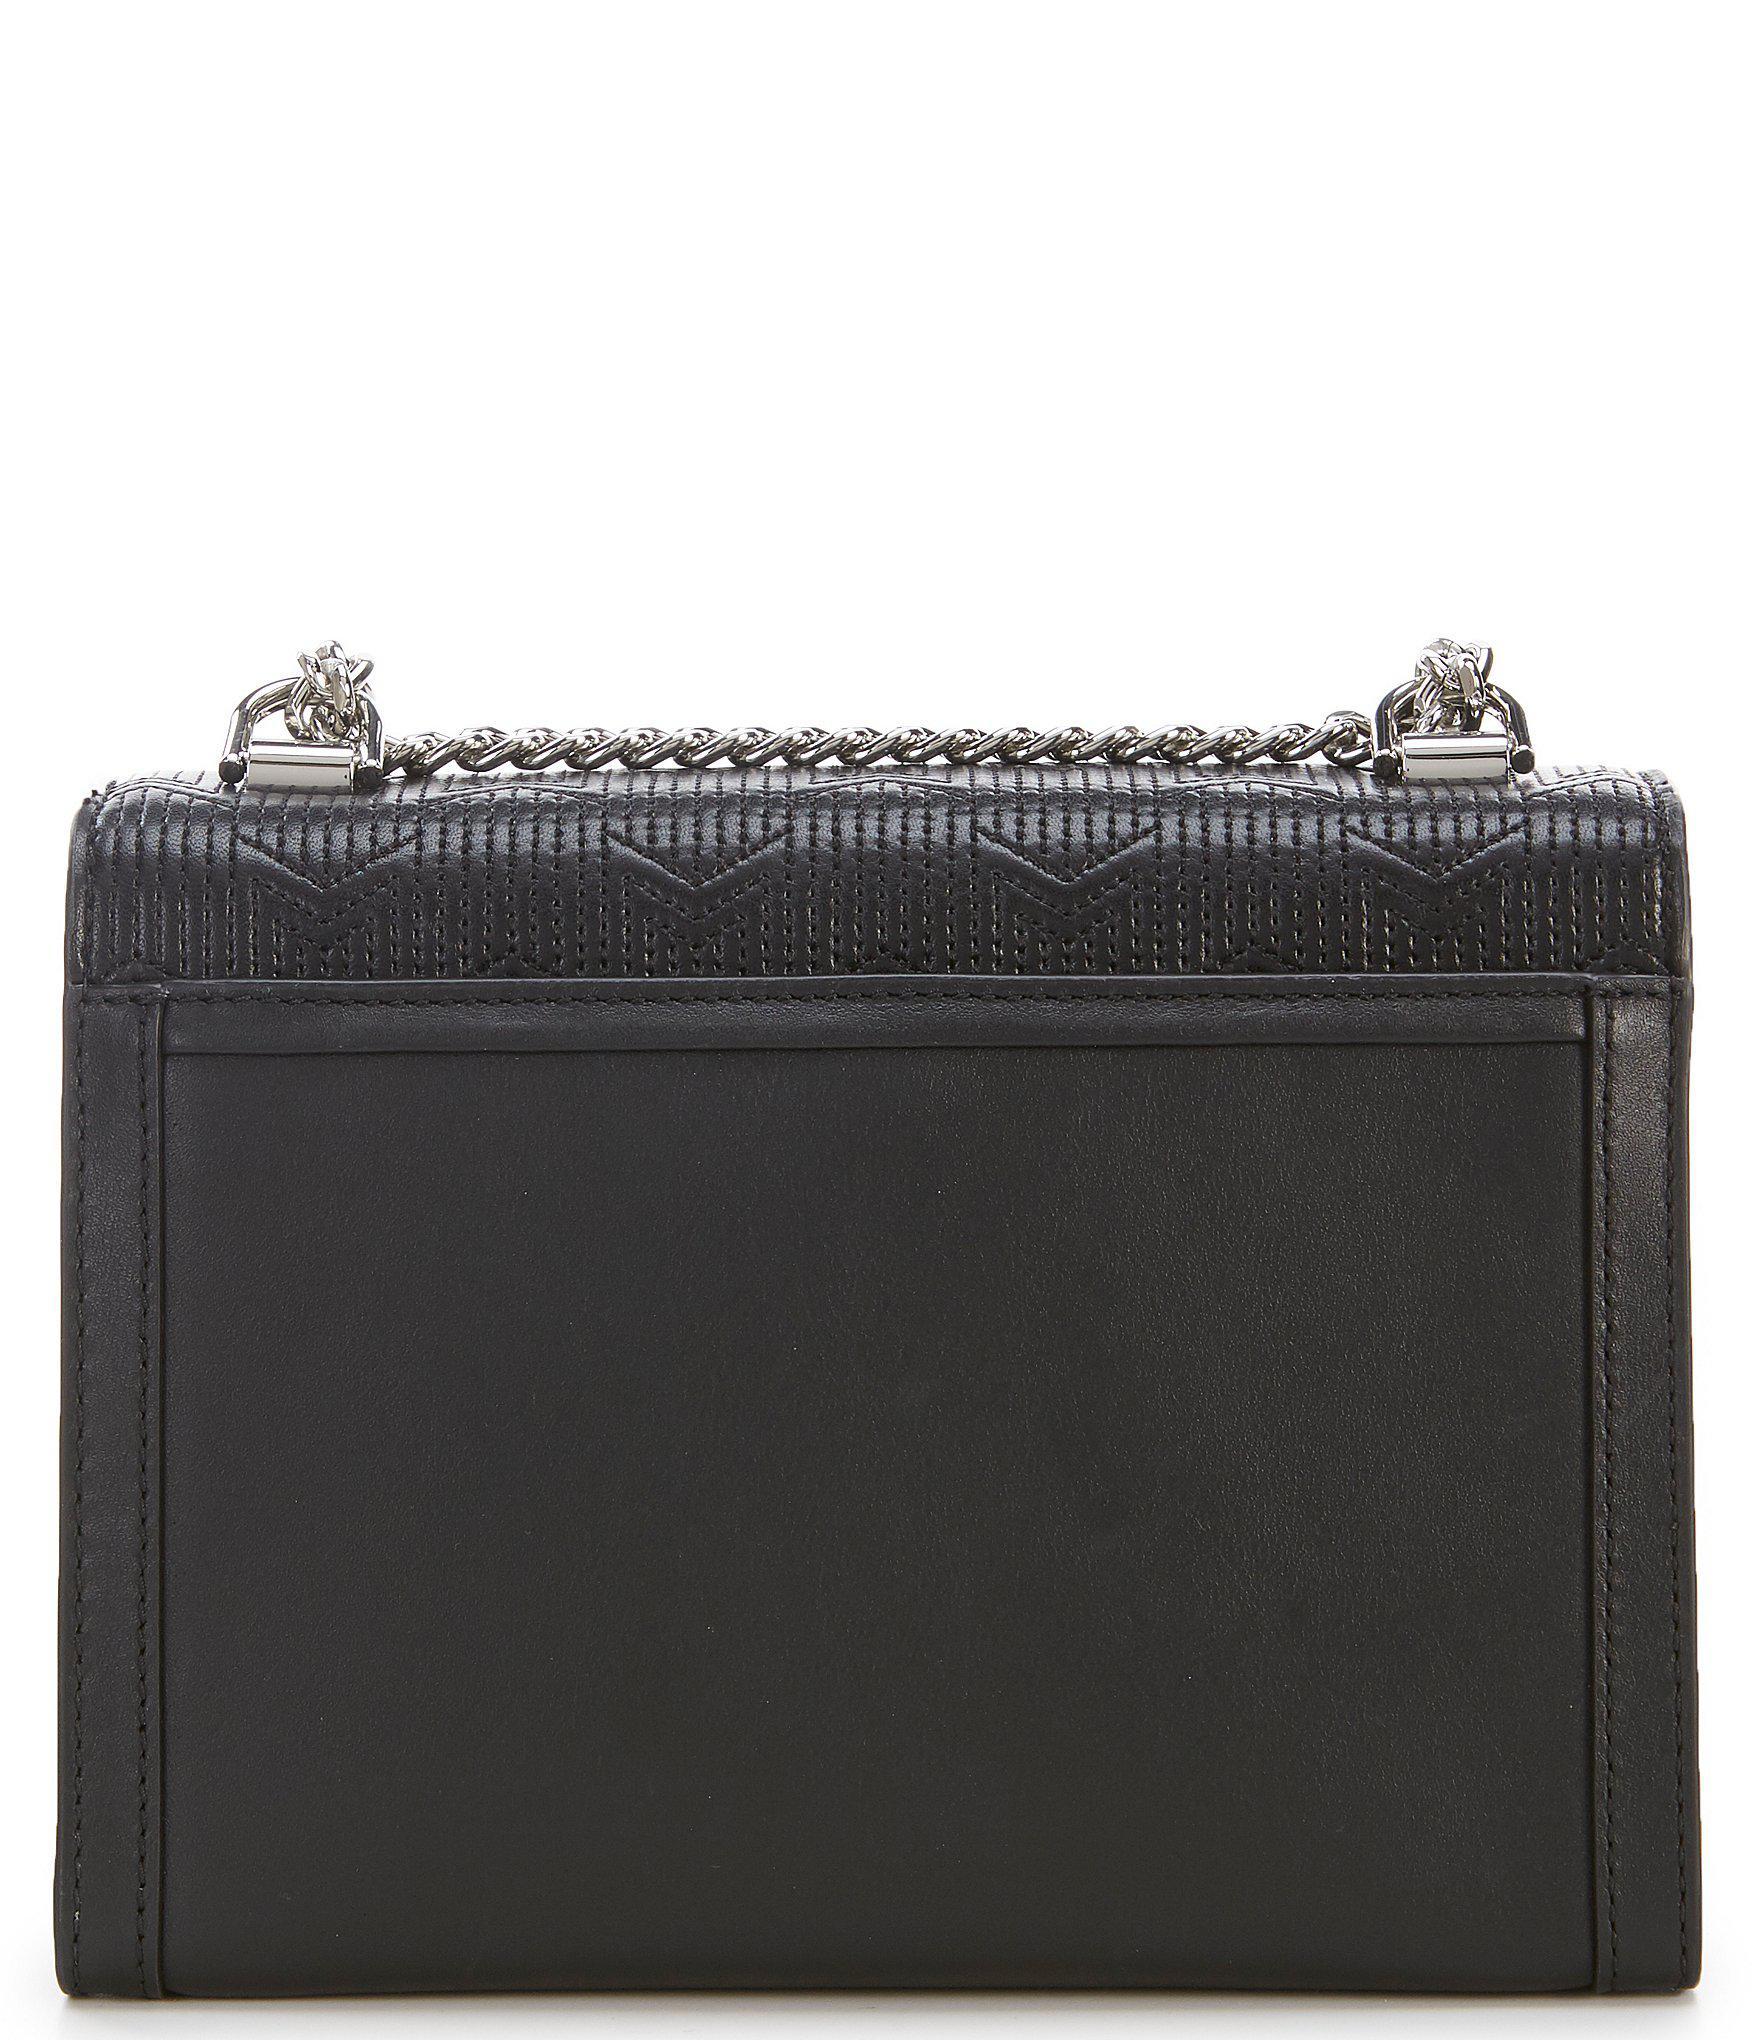 05eb5bdbf08e MICHAEL Michael Kors - Black Whitney Large Quilted Shoulder Bag - Lyst.  View fullscreen